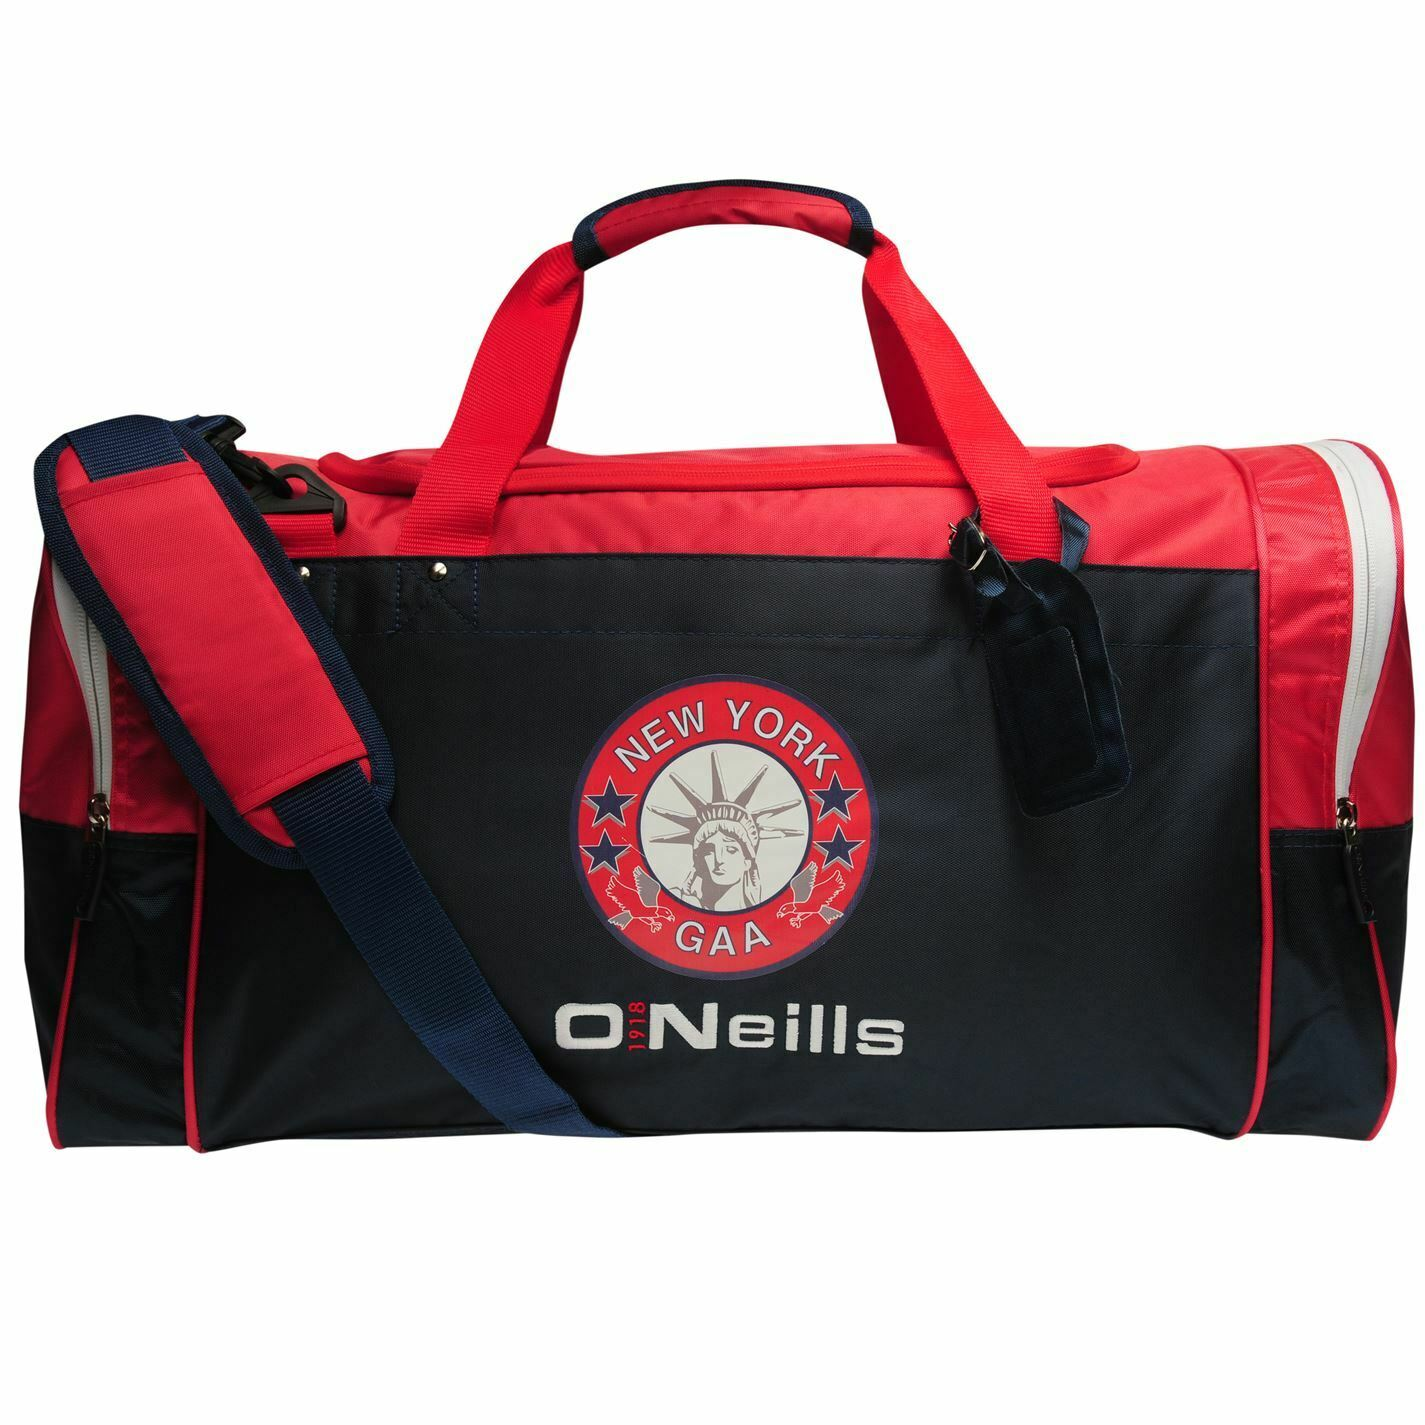 ONeills Unisex New York GAA Denver Holdall Bag Zip